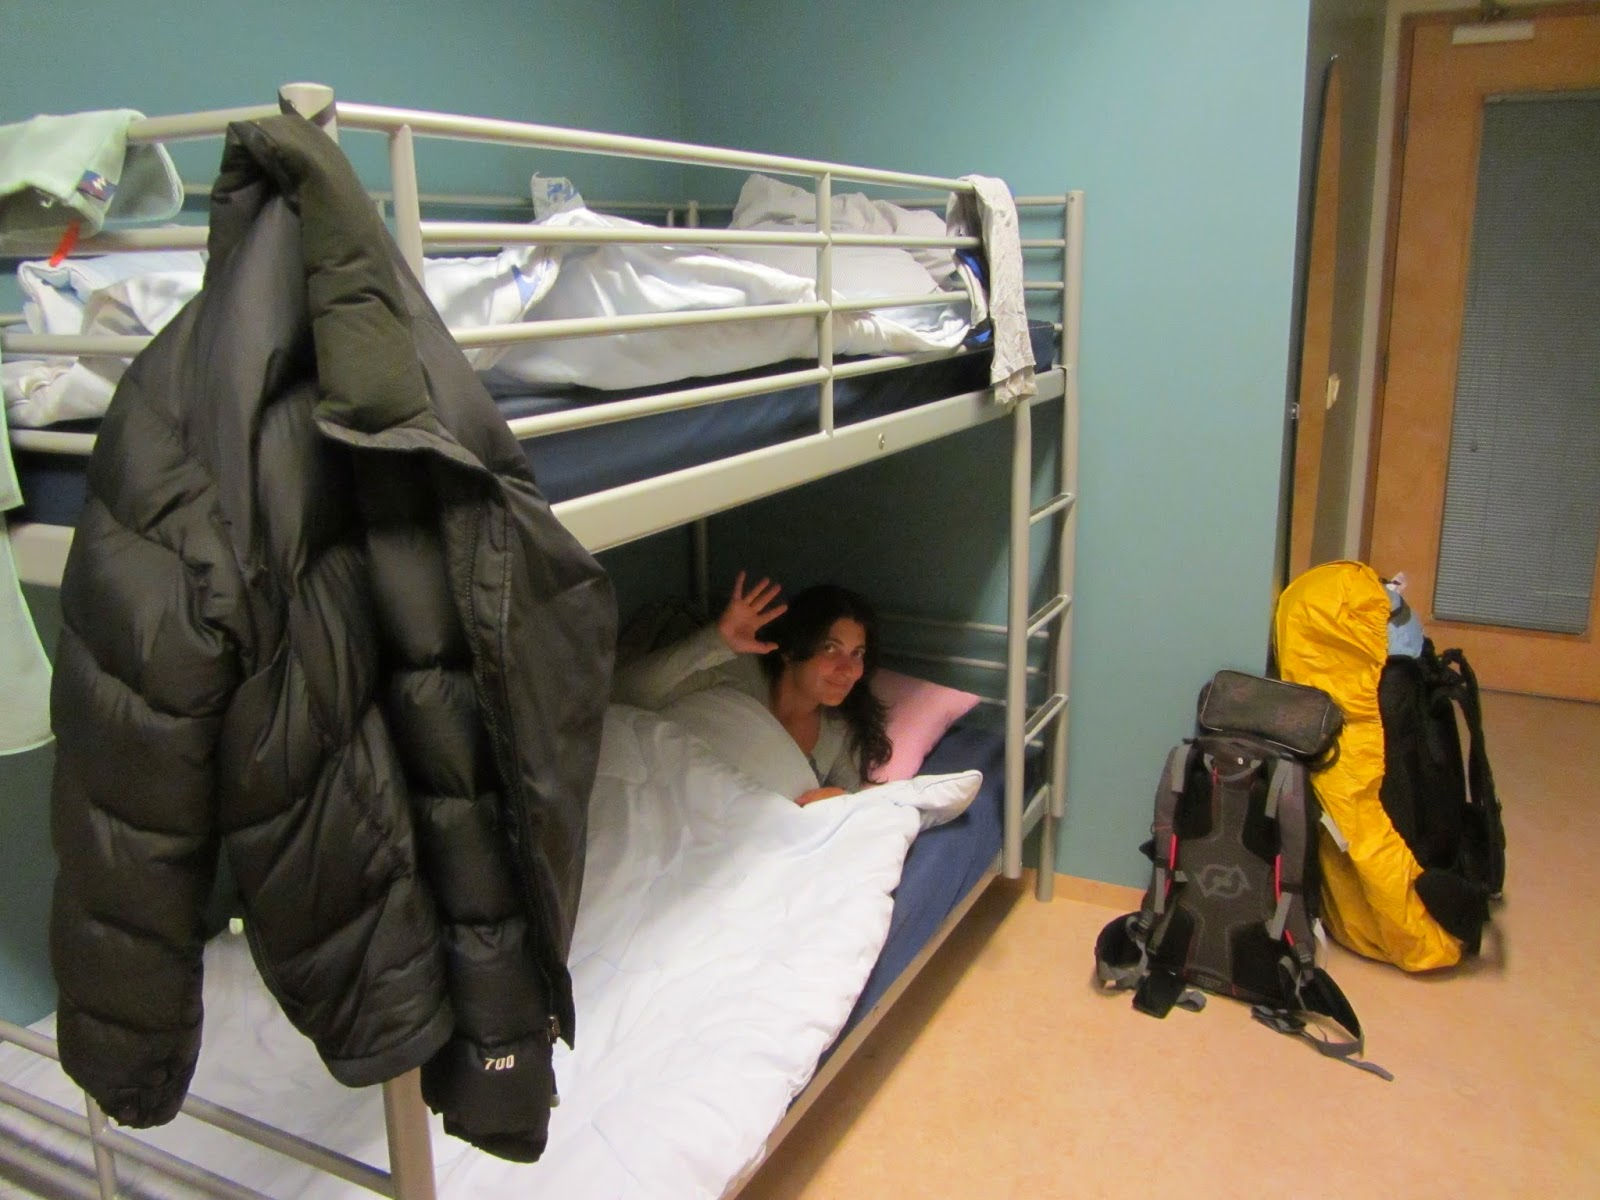 REYKJAVIK CITY HOSTEL - Onde dormir em Reykjavik | Islândia